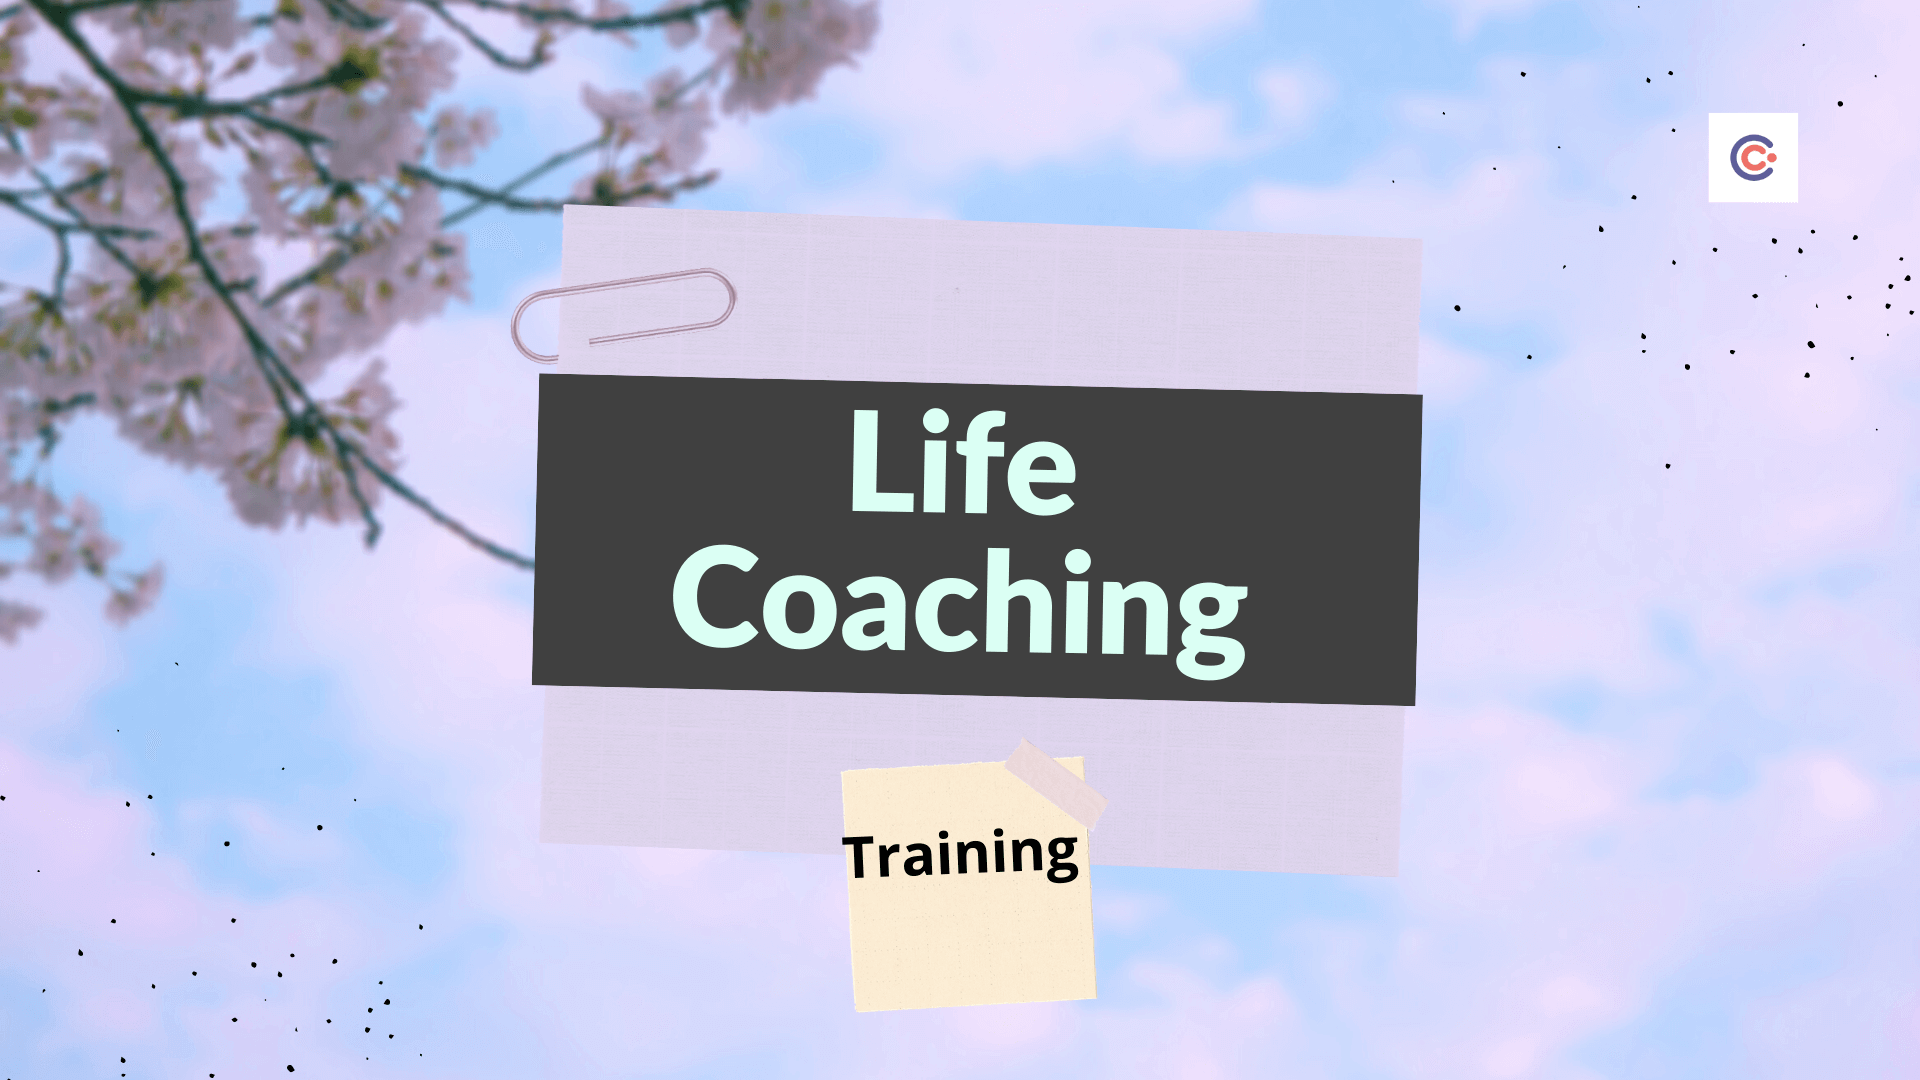 5 Best Life Coaching Training - Learn Life Coaching Online